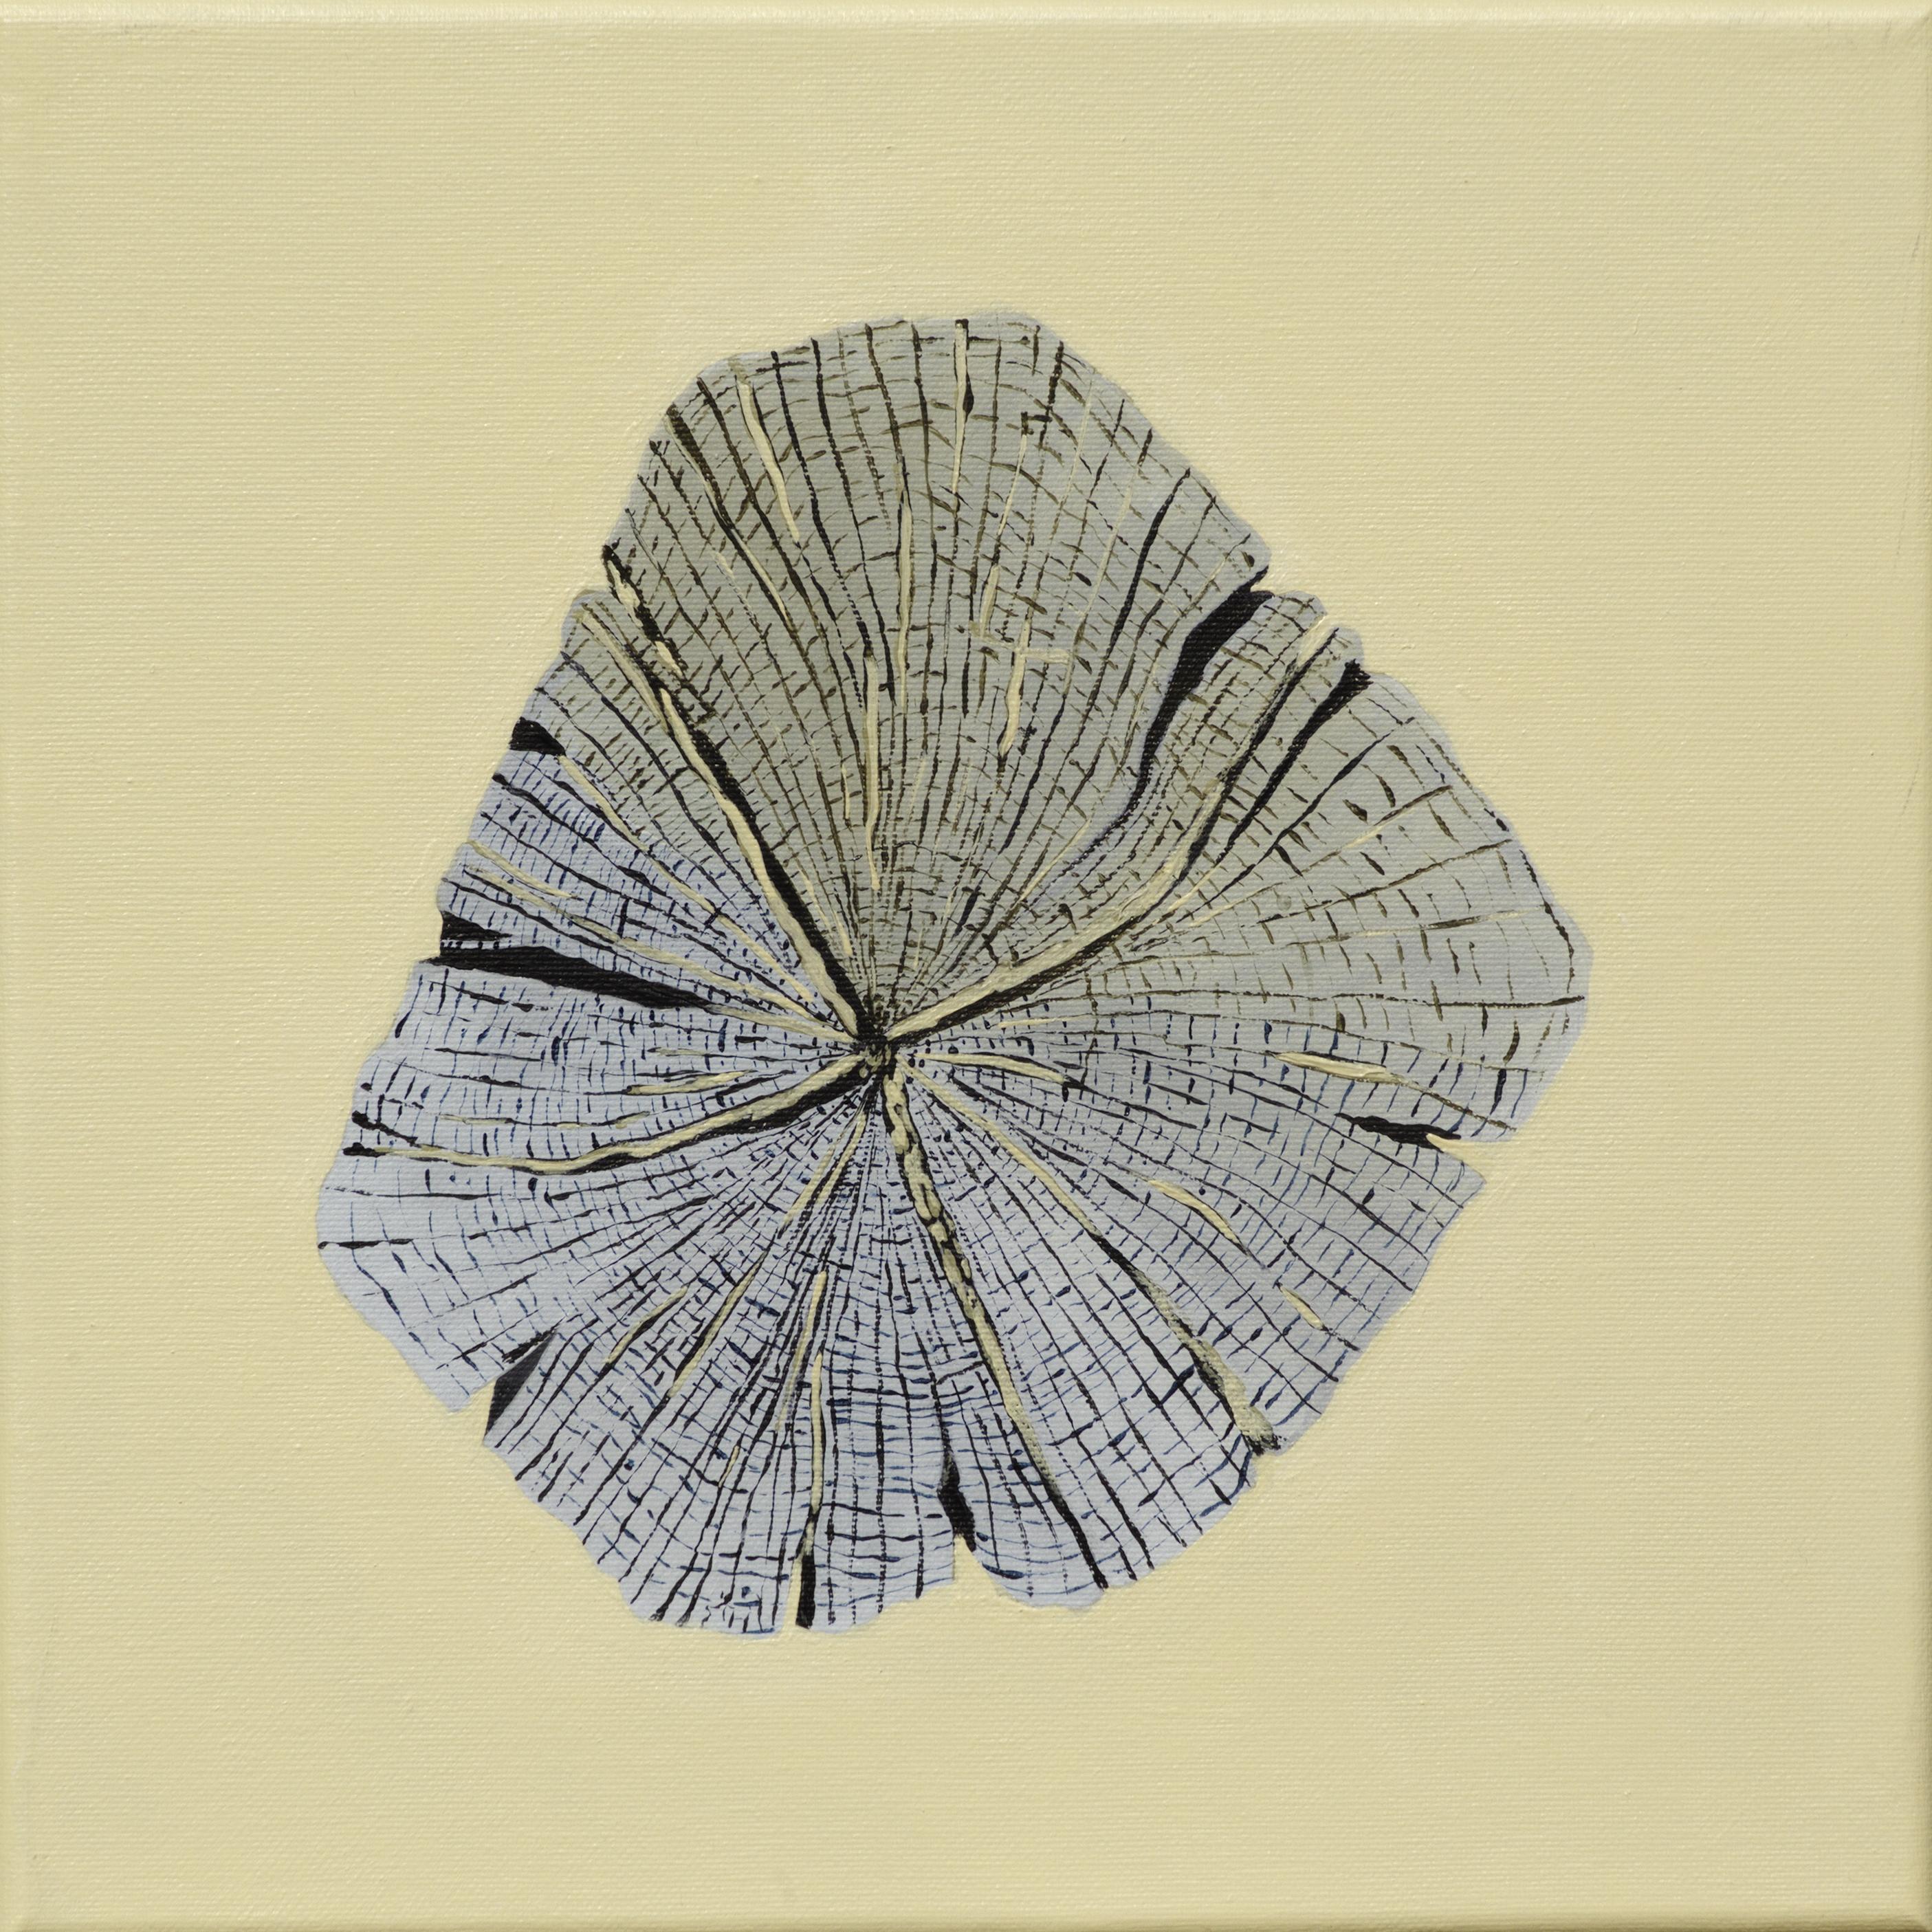 Paalkop 6 - acryl op canvas - 30 x 30 cm